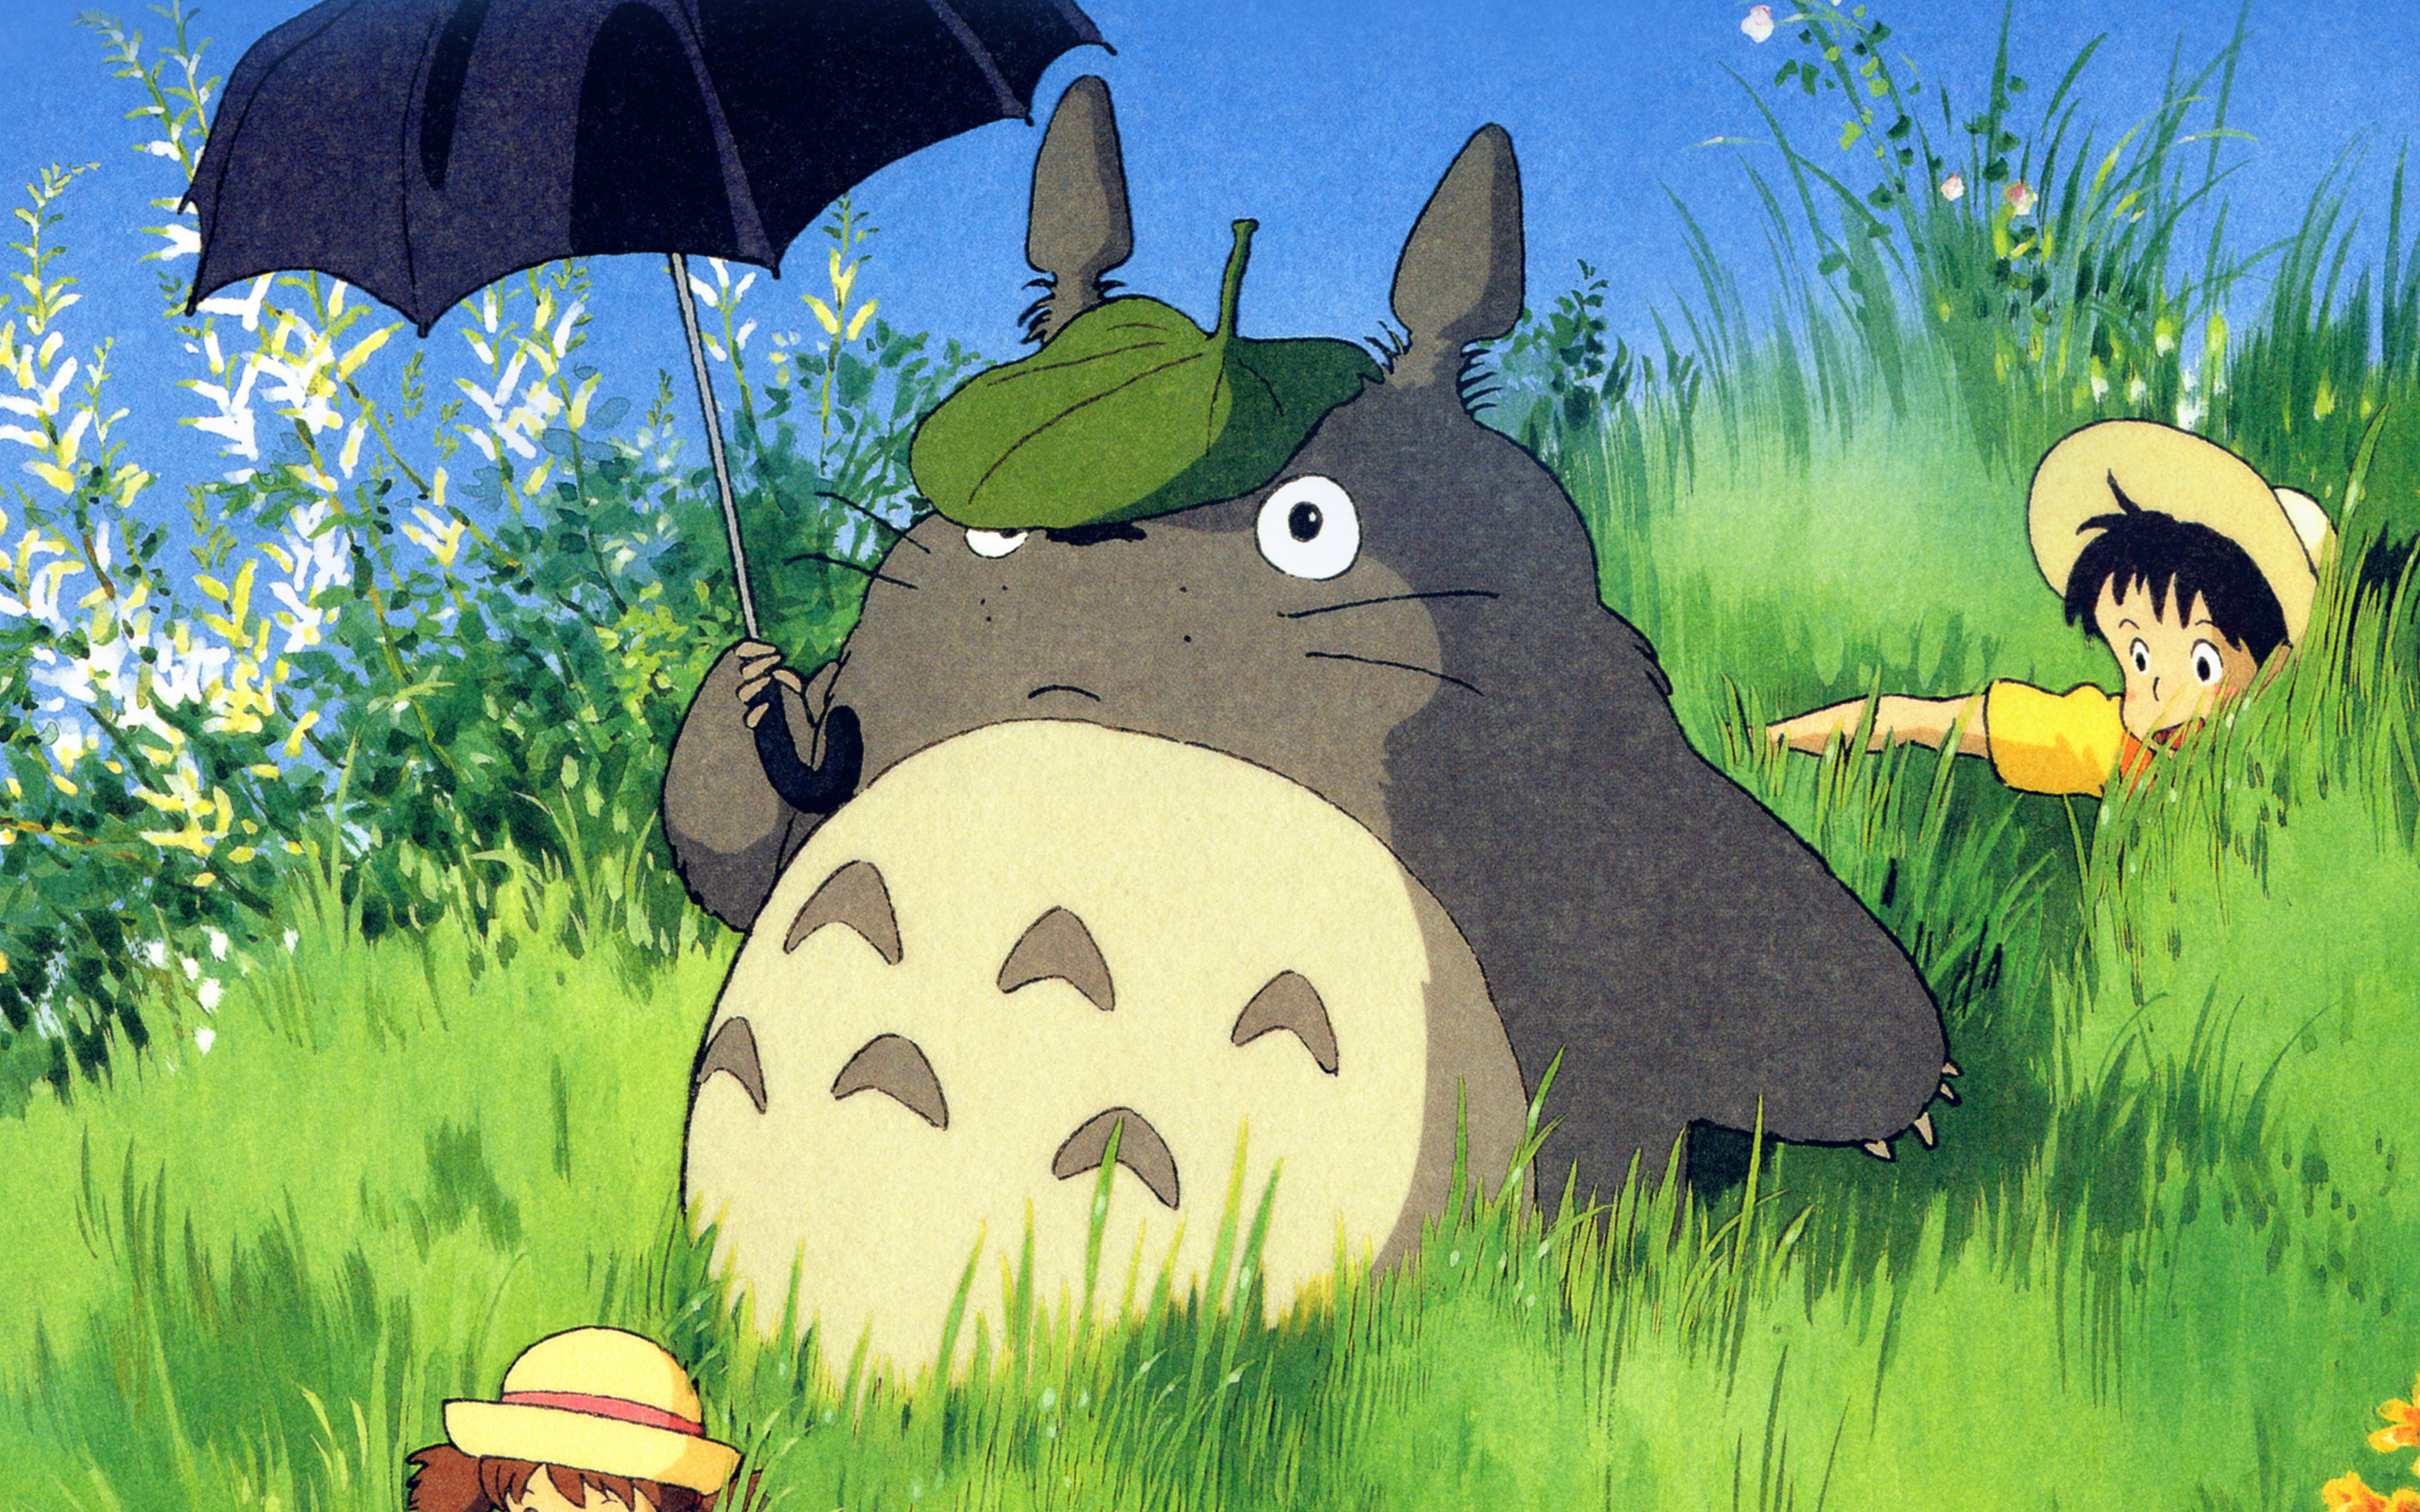 Ap13 Totoro Art Cute Anime Illustration